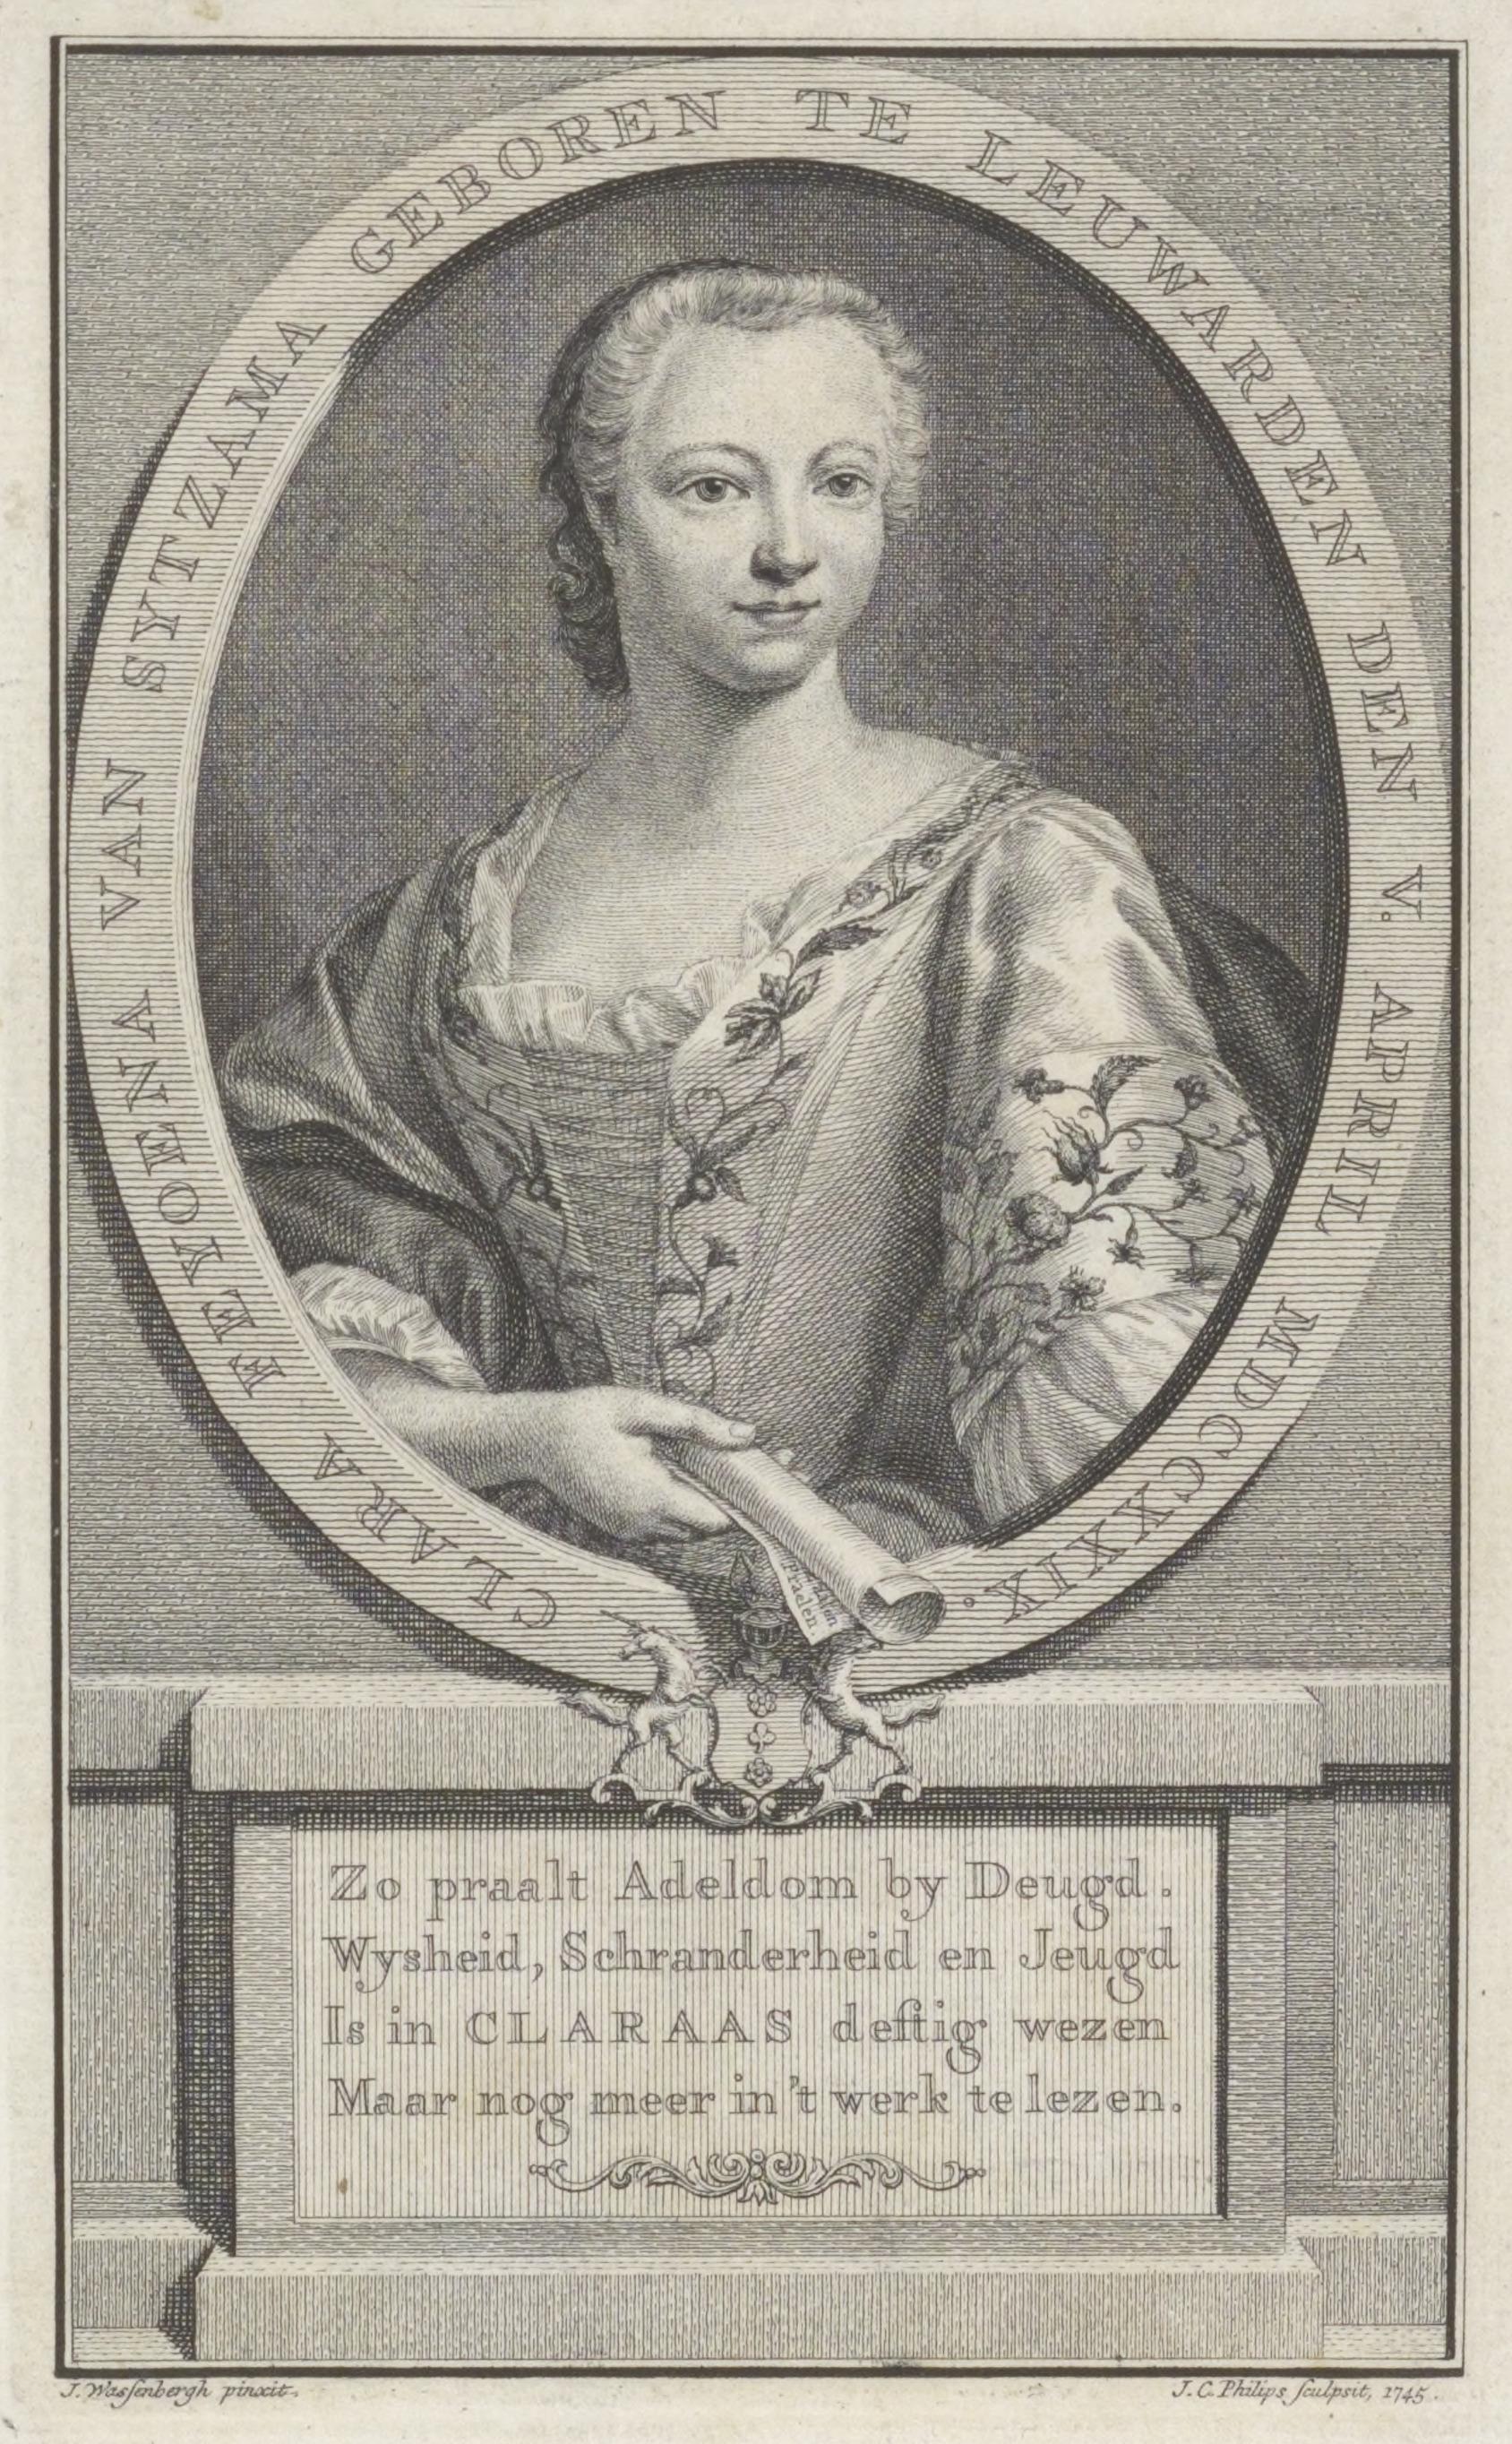 Clare Feyoena van Raesfelt-Van Sytzama